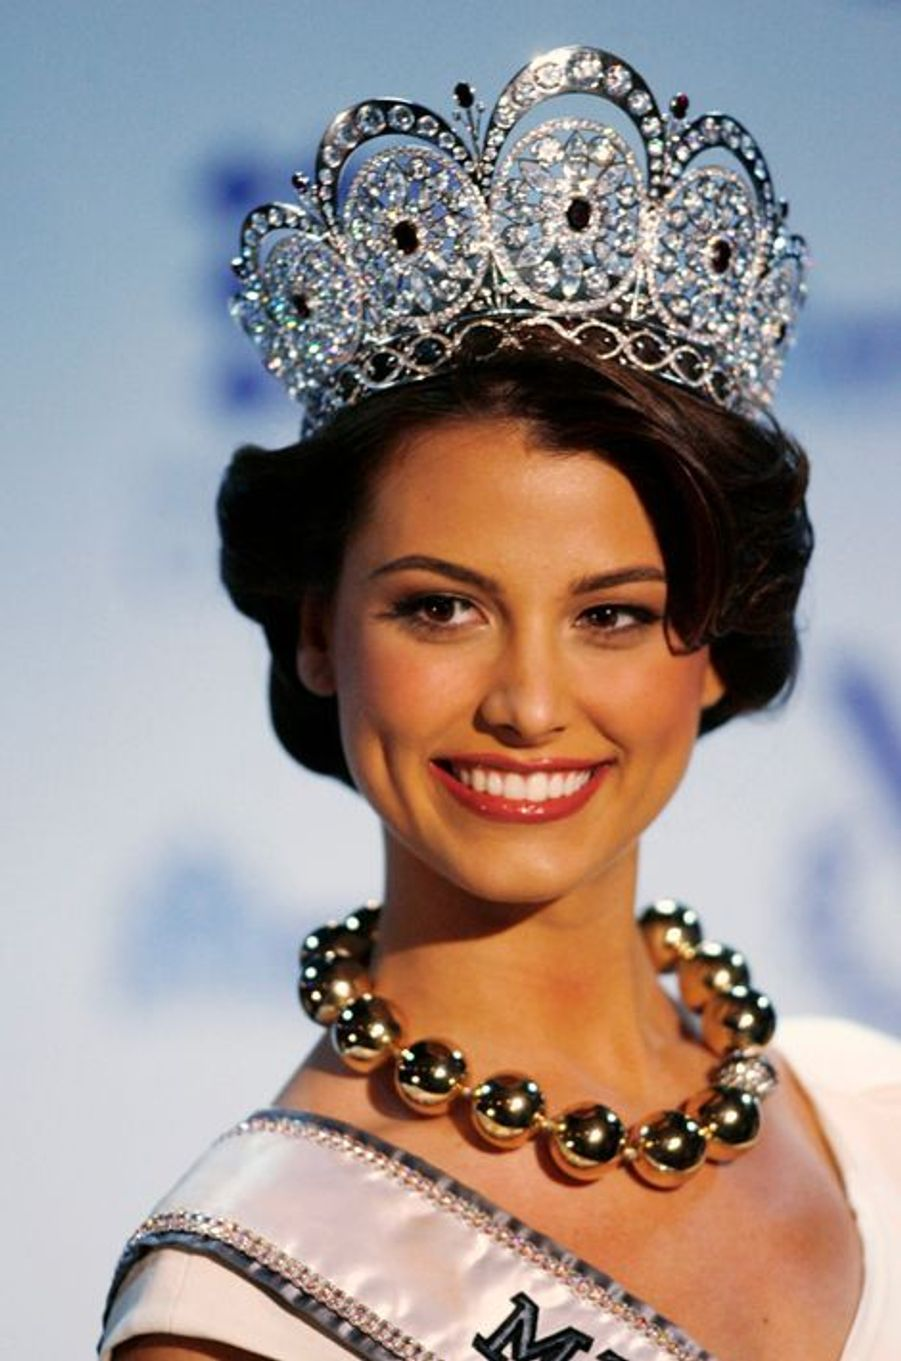 Stefania Fernandez, Miss Venezuela élue Miss Univers 2009